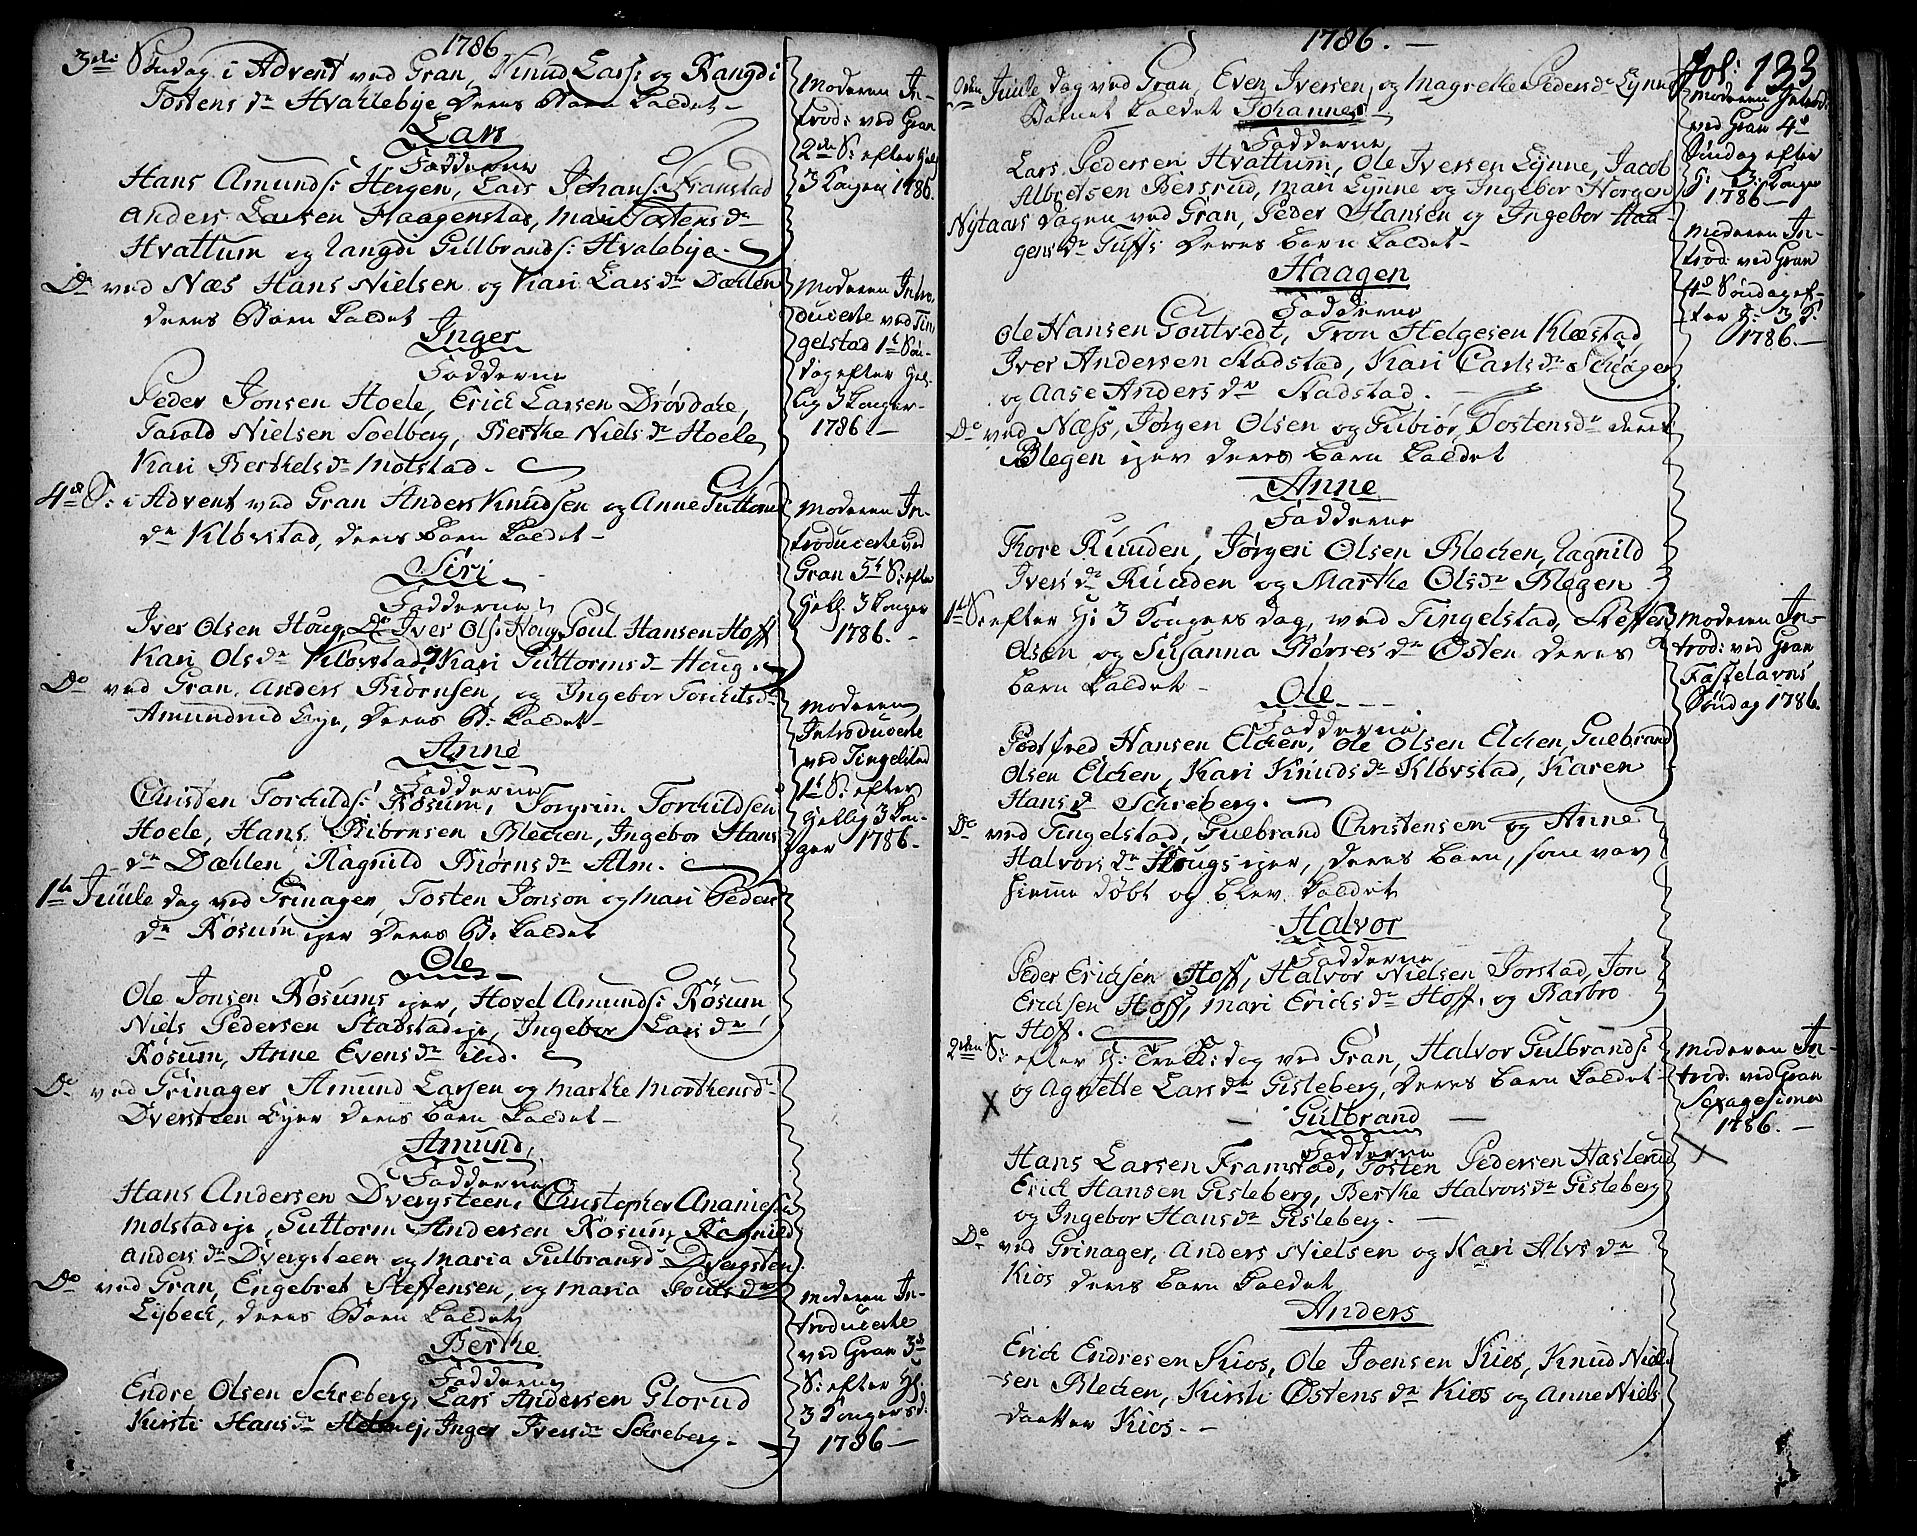 SAH, Gran prestekontor, Ministerialbok nr. 5, 1776-1788, s. 133